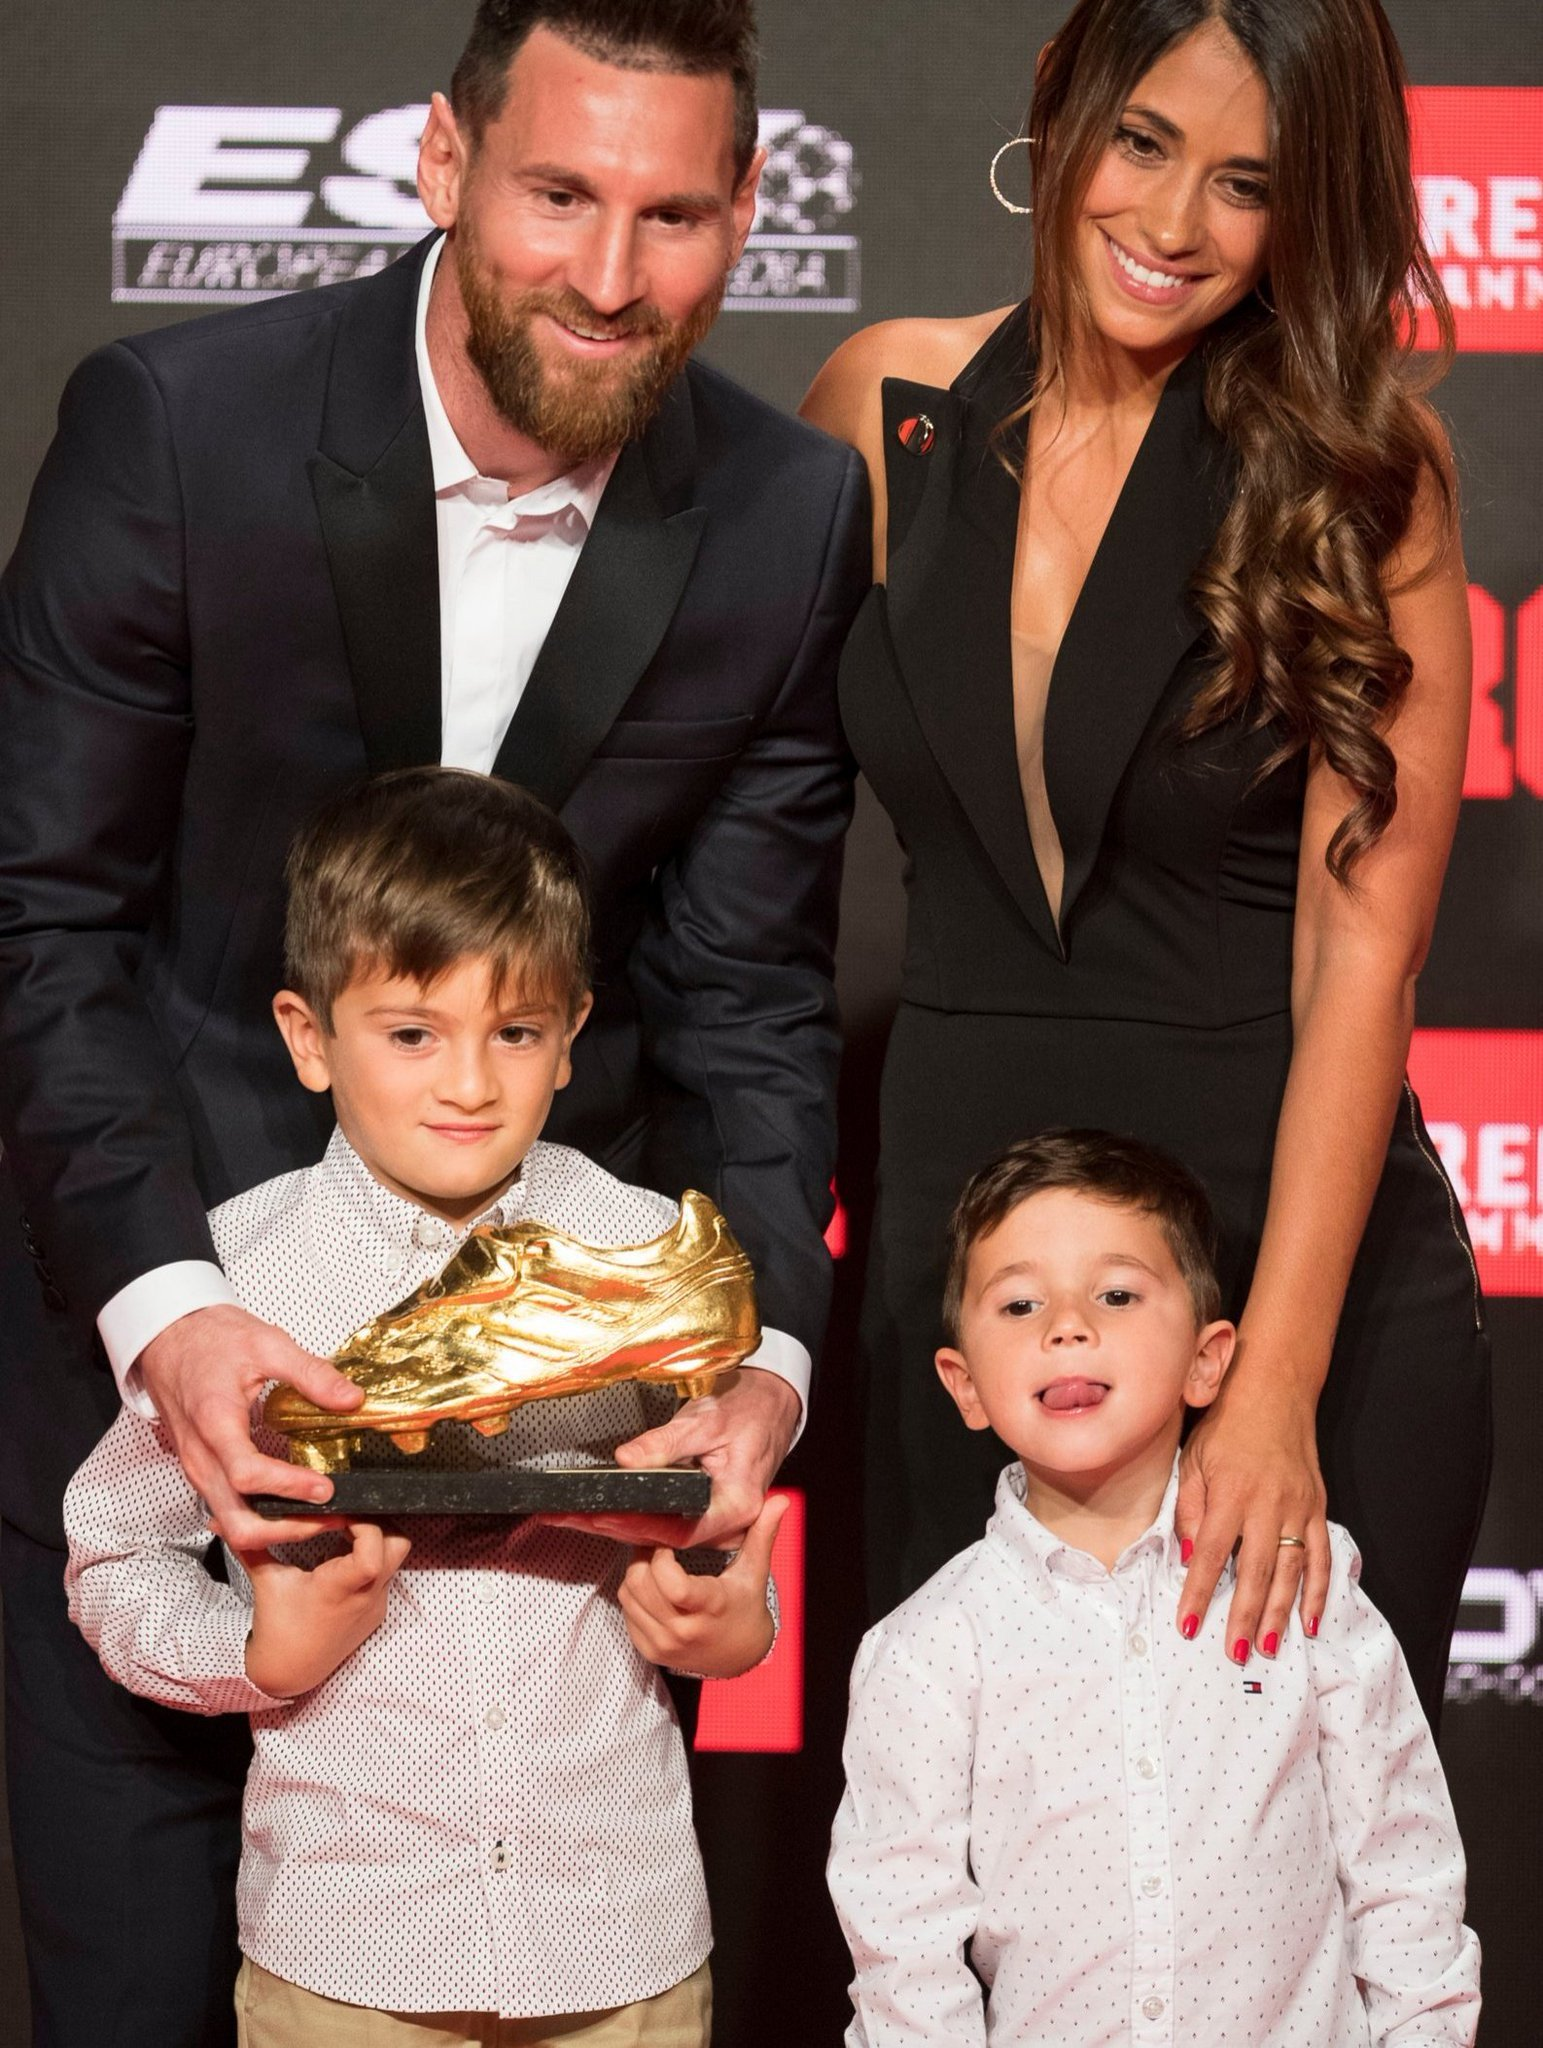 Messi Wins Third Straight Golden Shoe